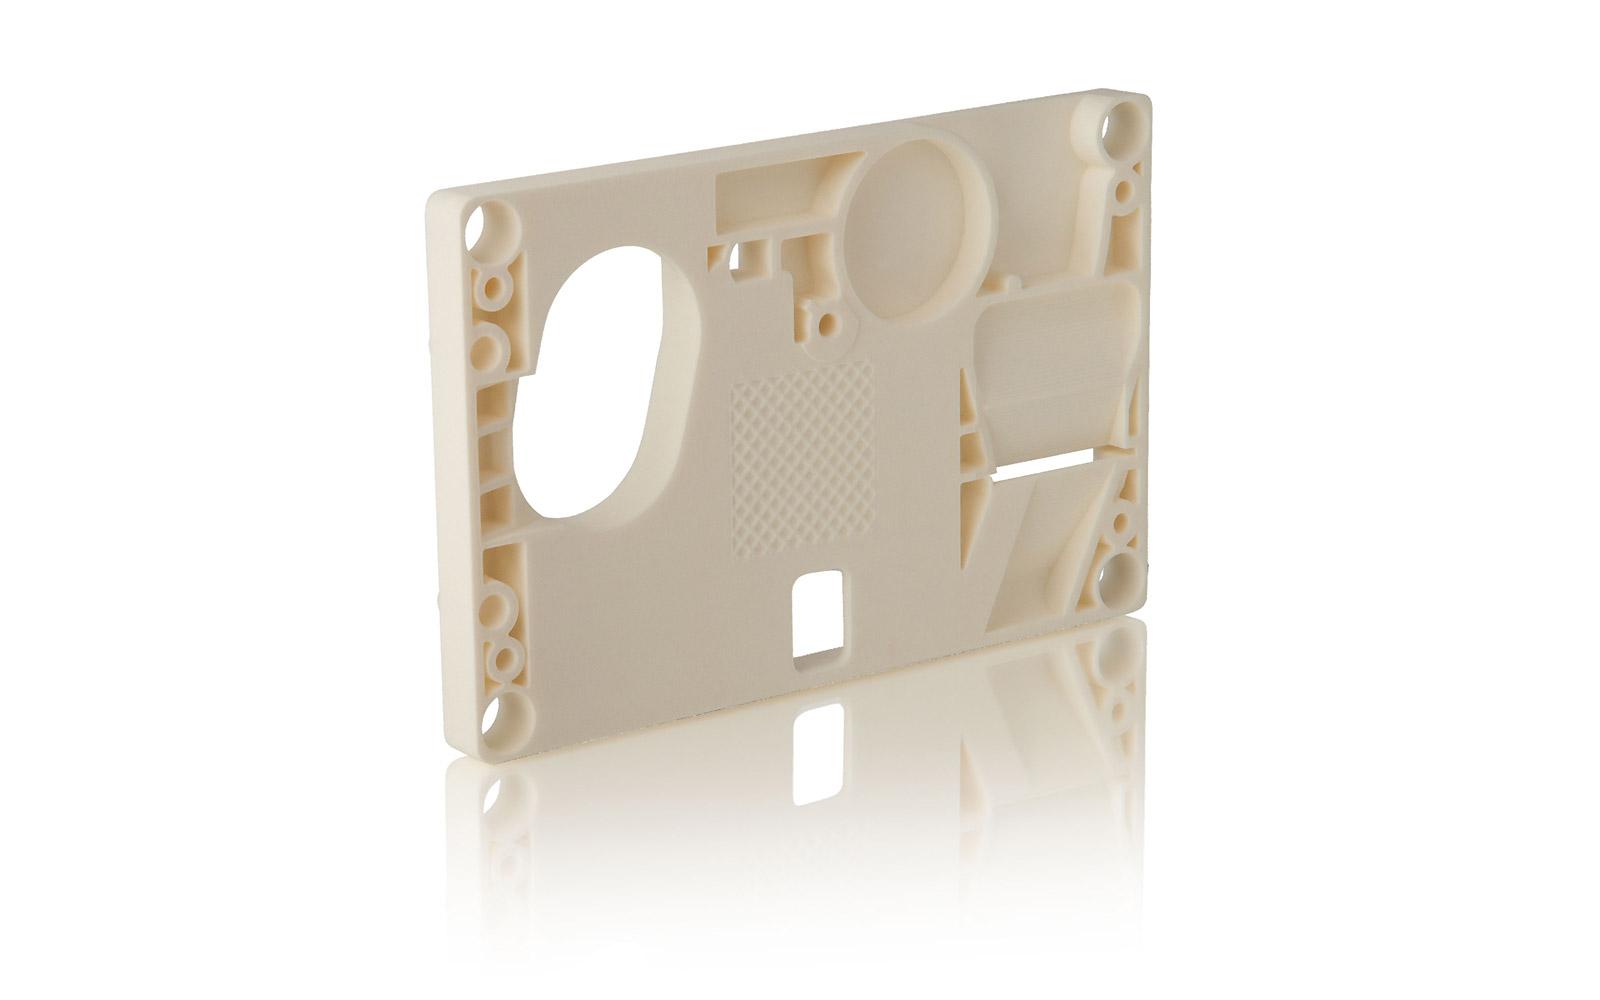 Selektives Lasersintern: detailgetreue und funktionstüchtige Prototypen